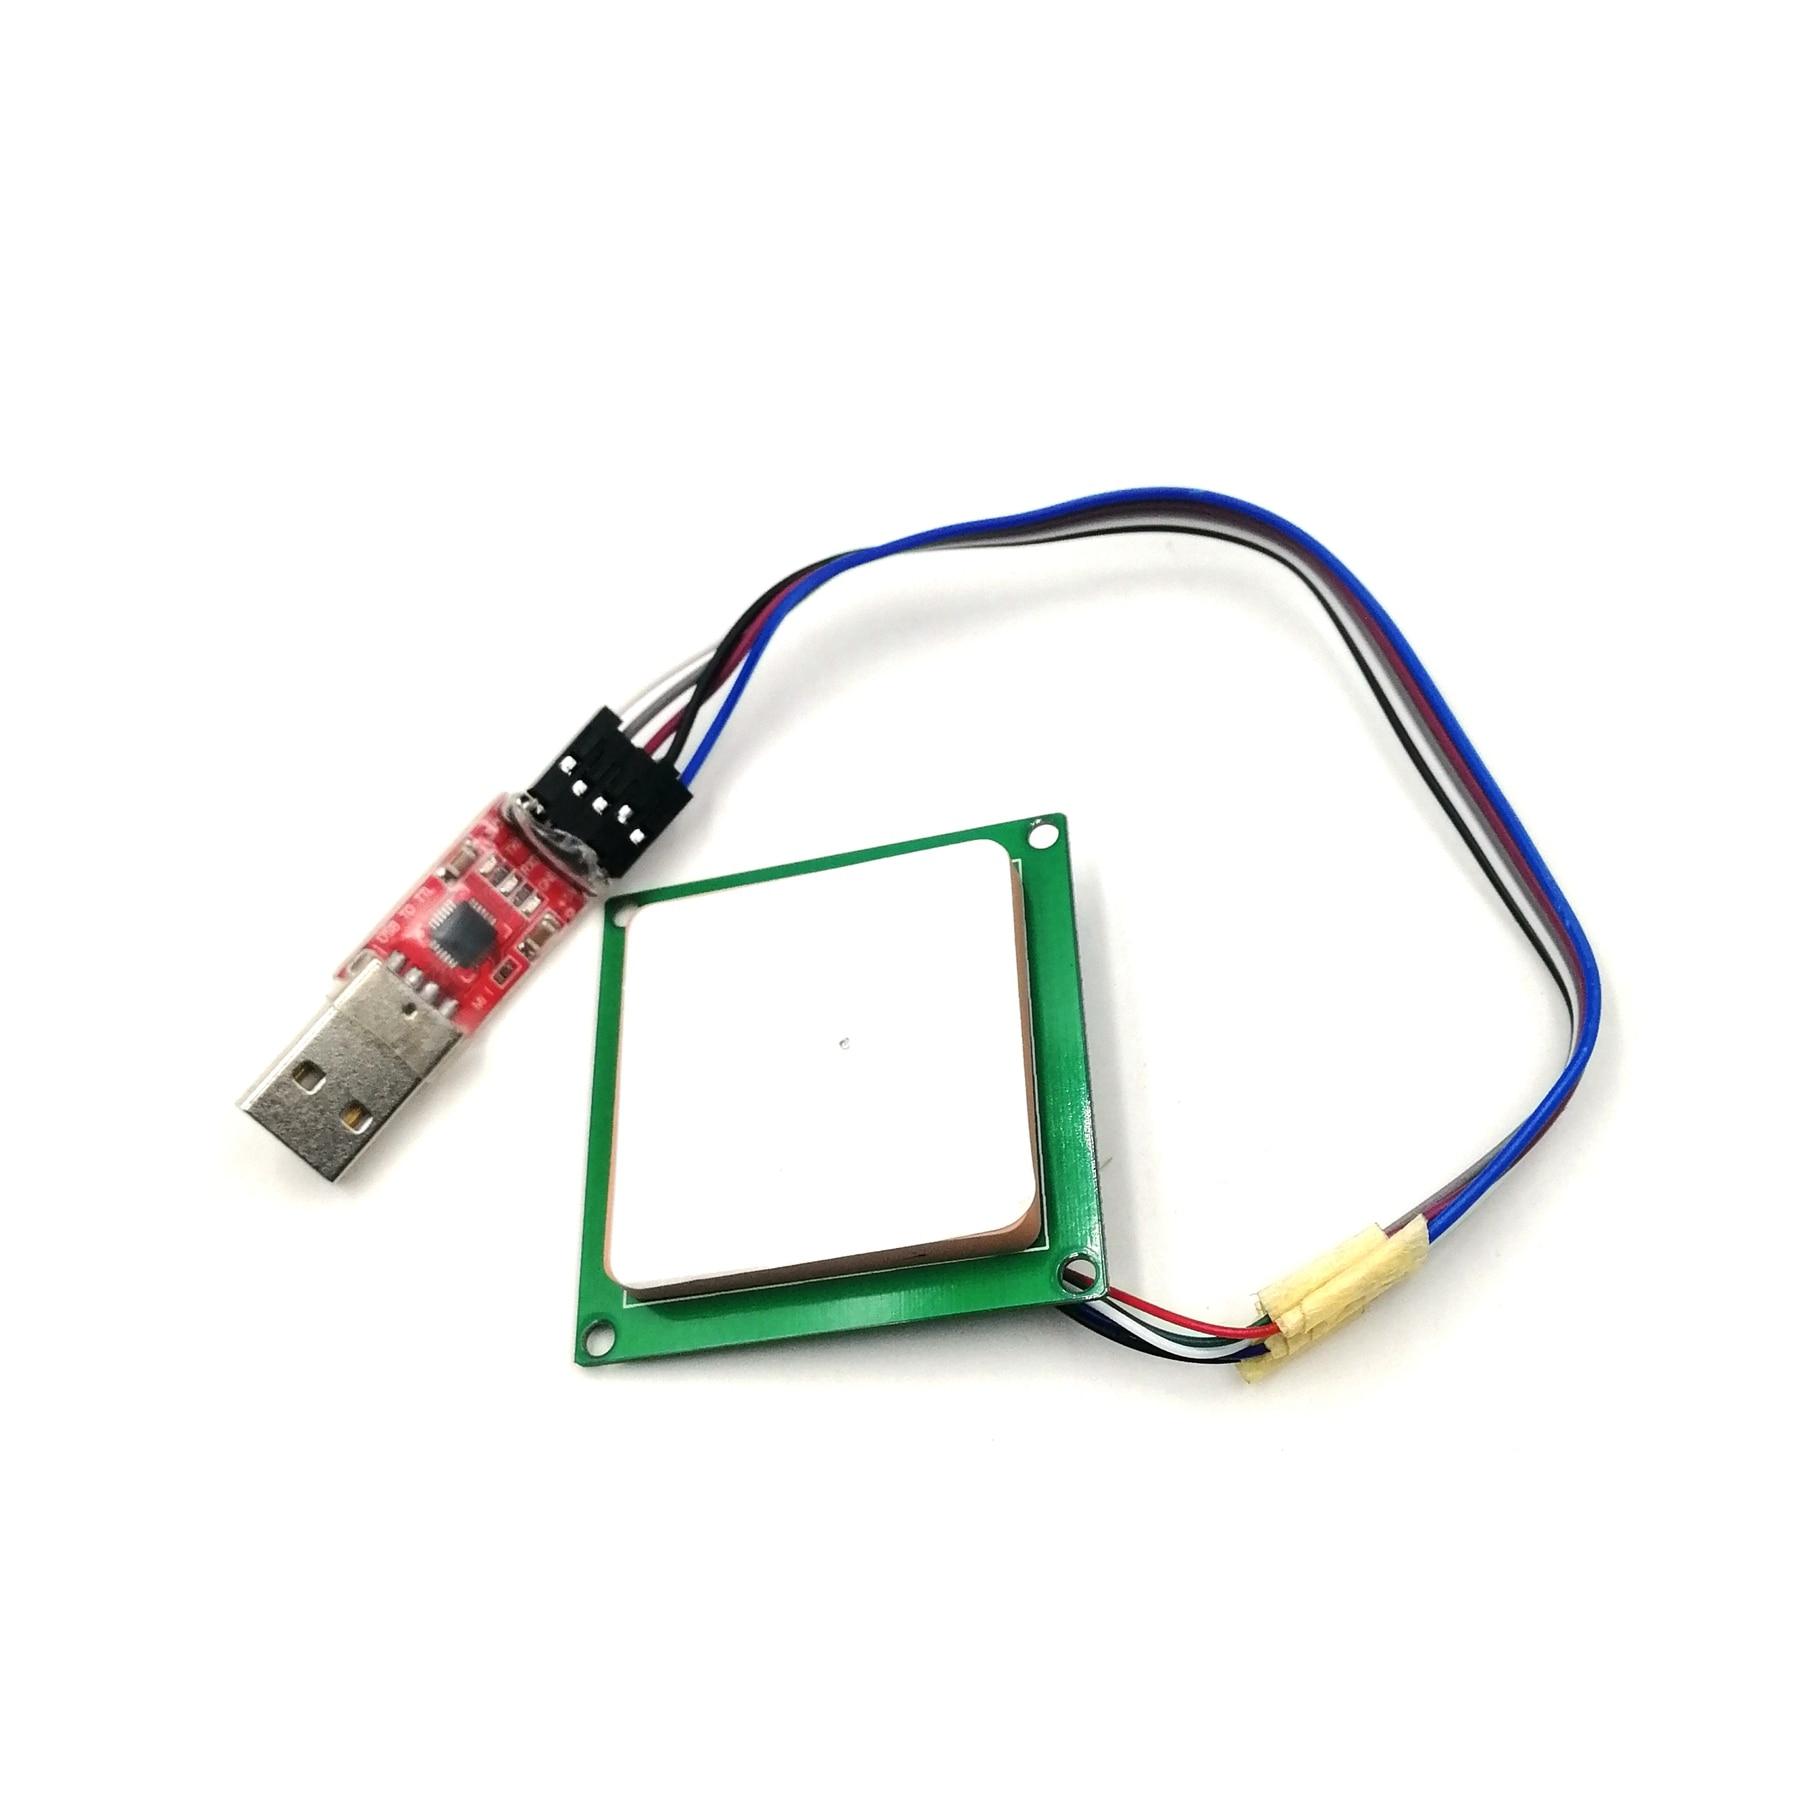 0 3M Long Range UHF Integrated Reader Writer Module 865 868MHz 915mhz 902 928MHz Uart Passive